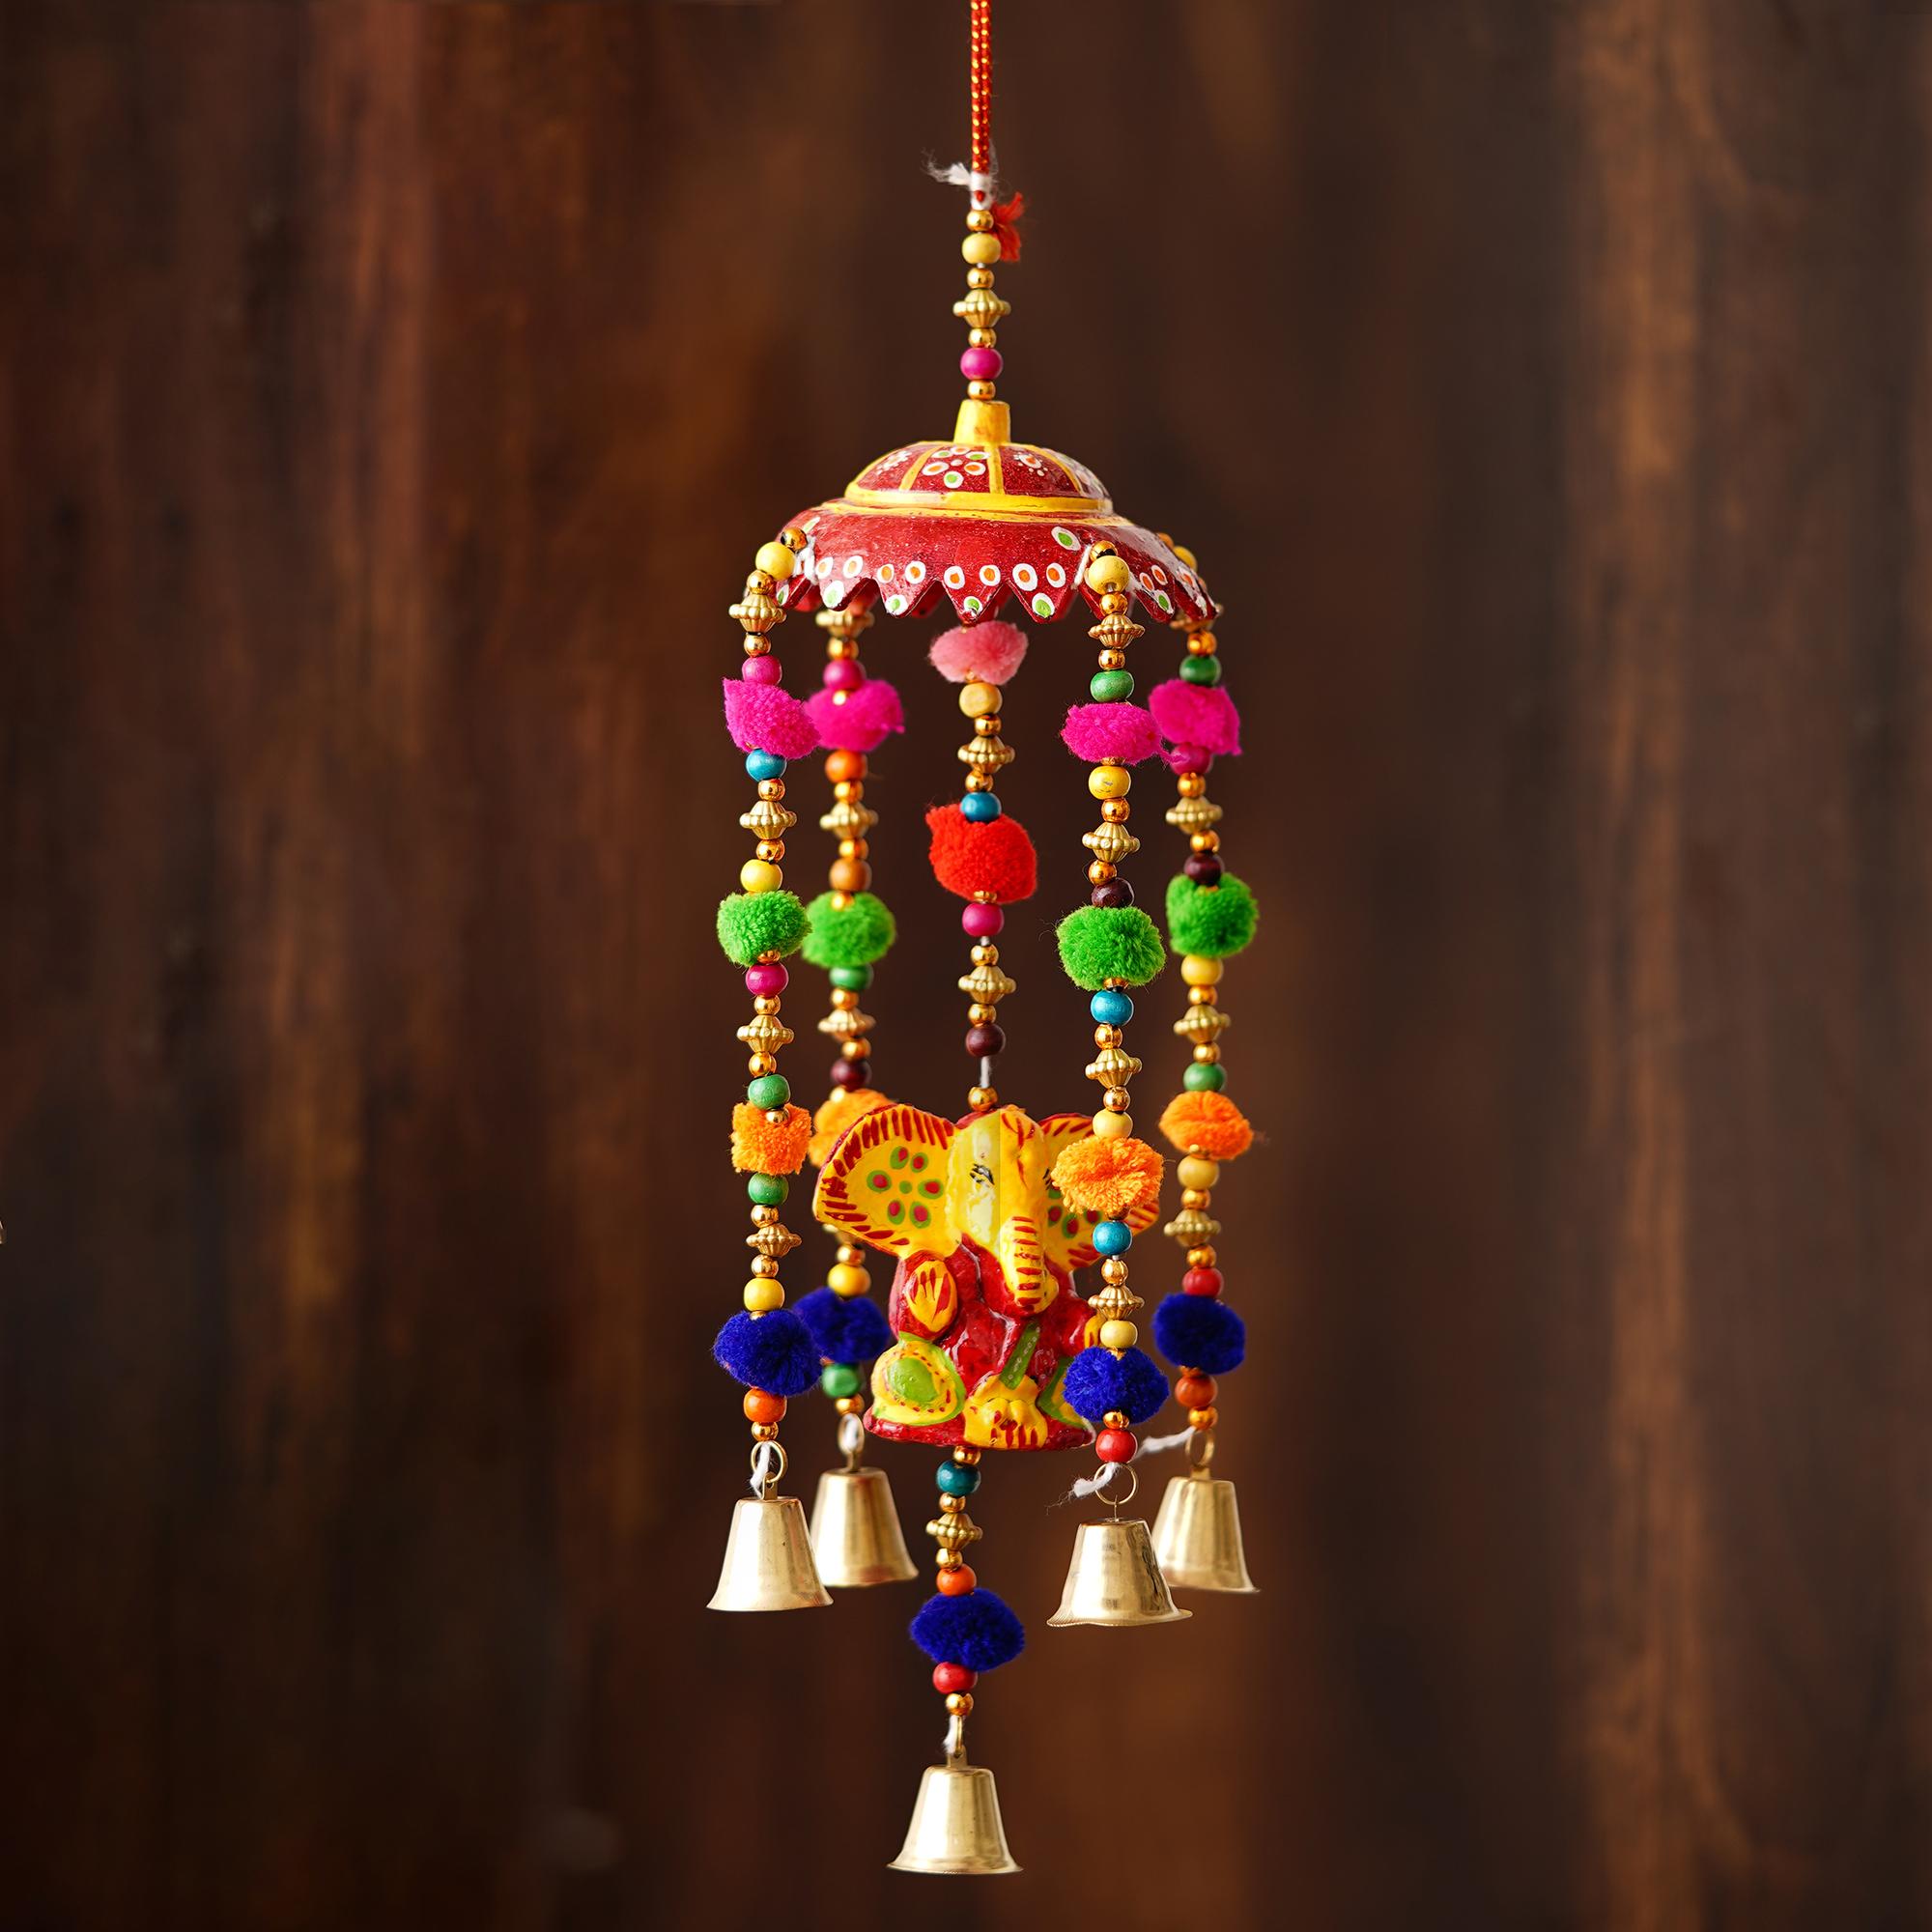 Handcrafted Decorative Lord Ganesha Wall/Door/Window Hanging Bells Indian Home Decor